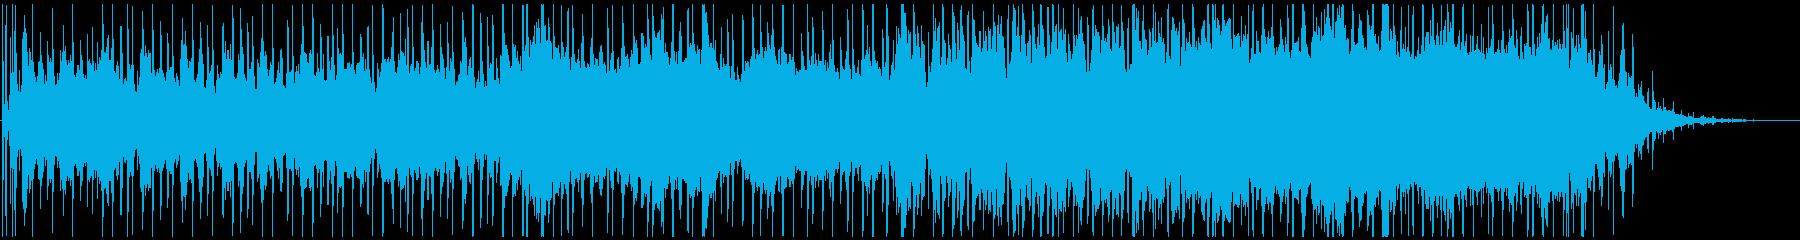 TOTO風ギターロックインスト【AOR】の再生済みの波形